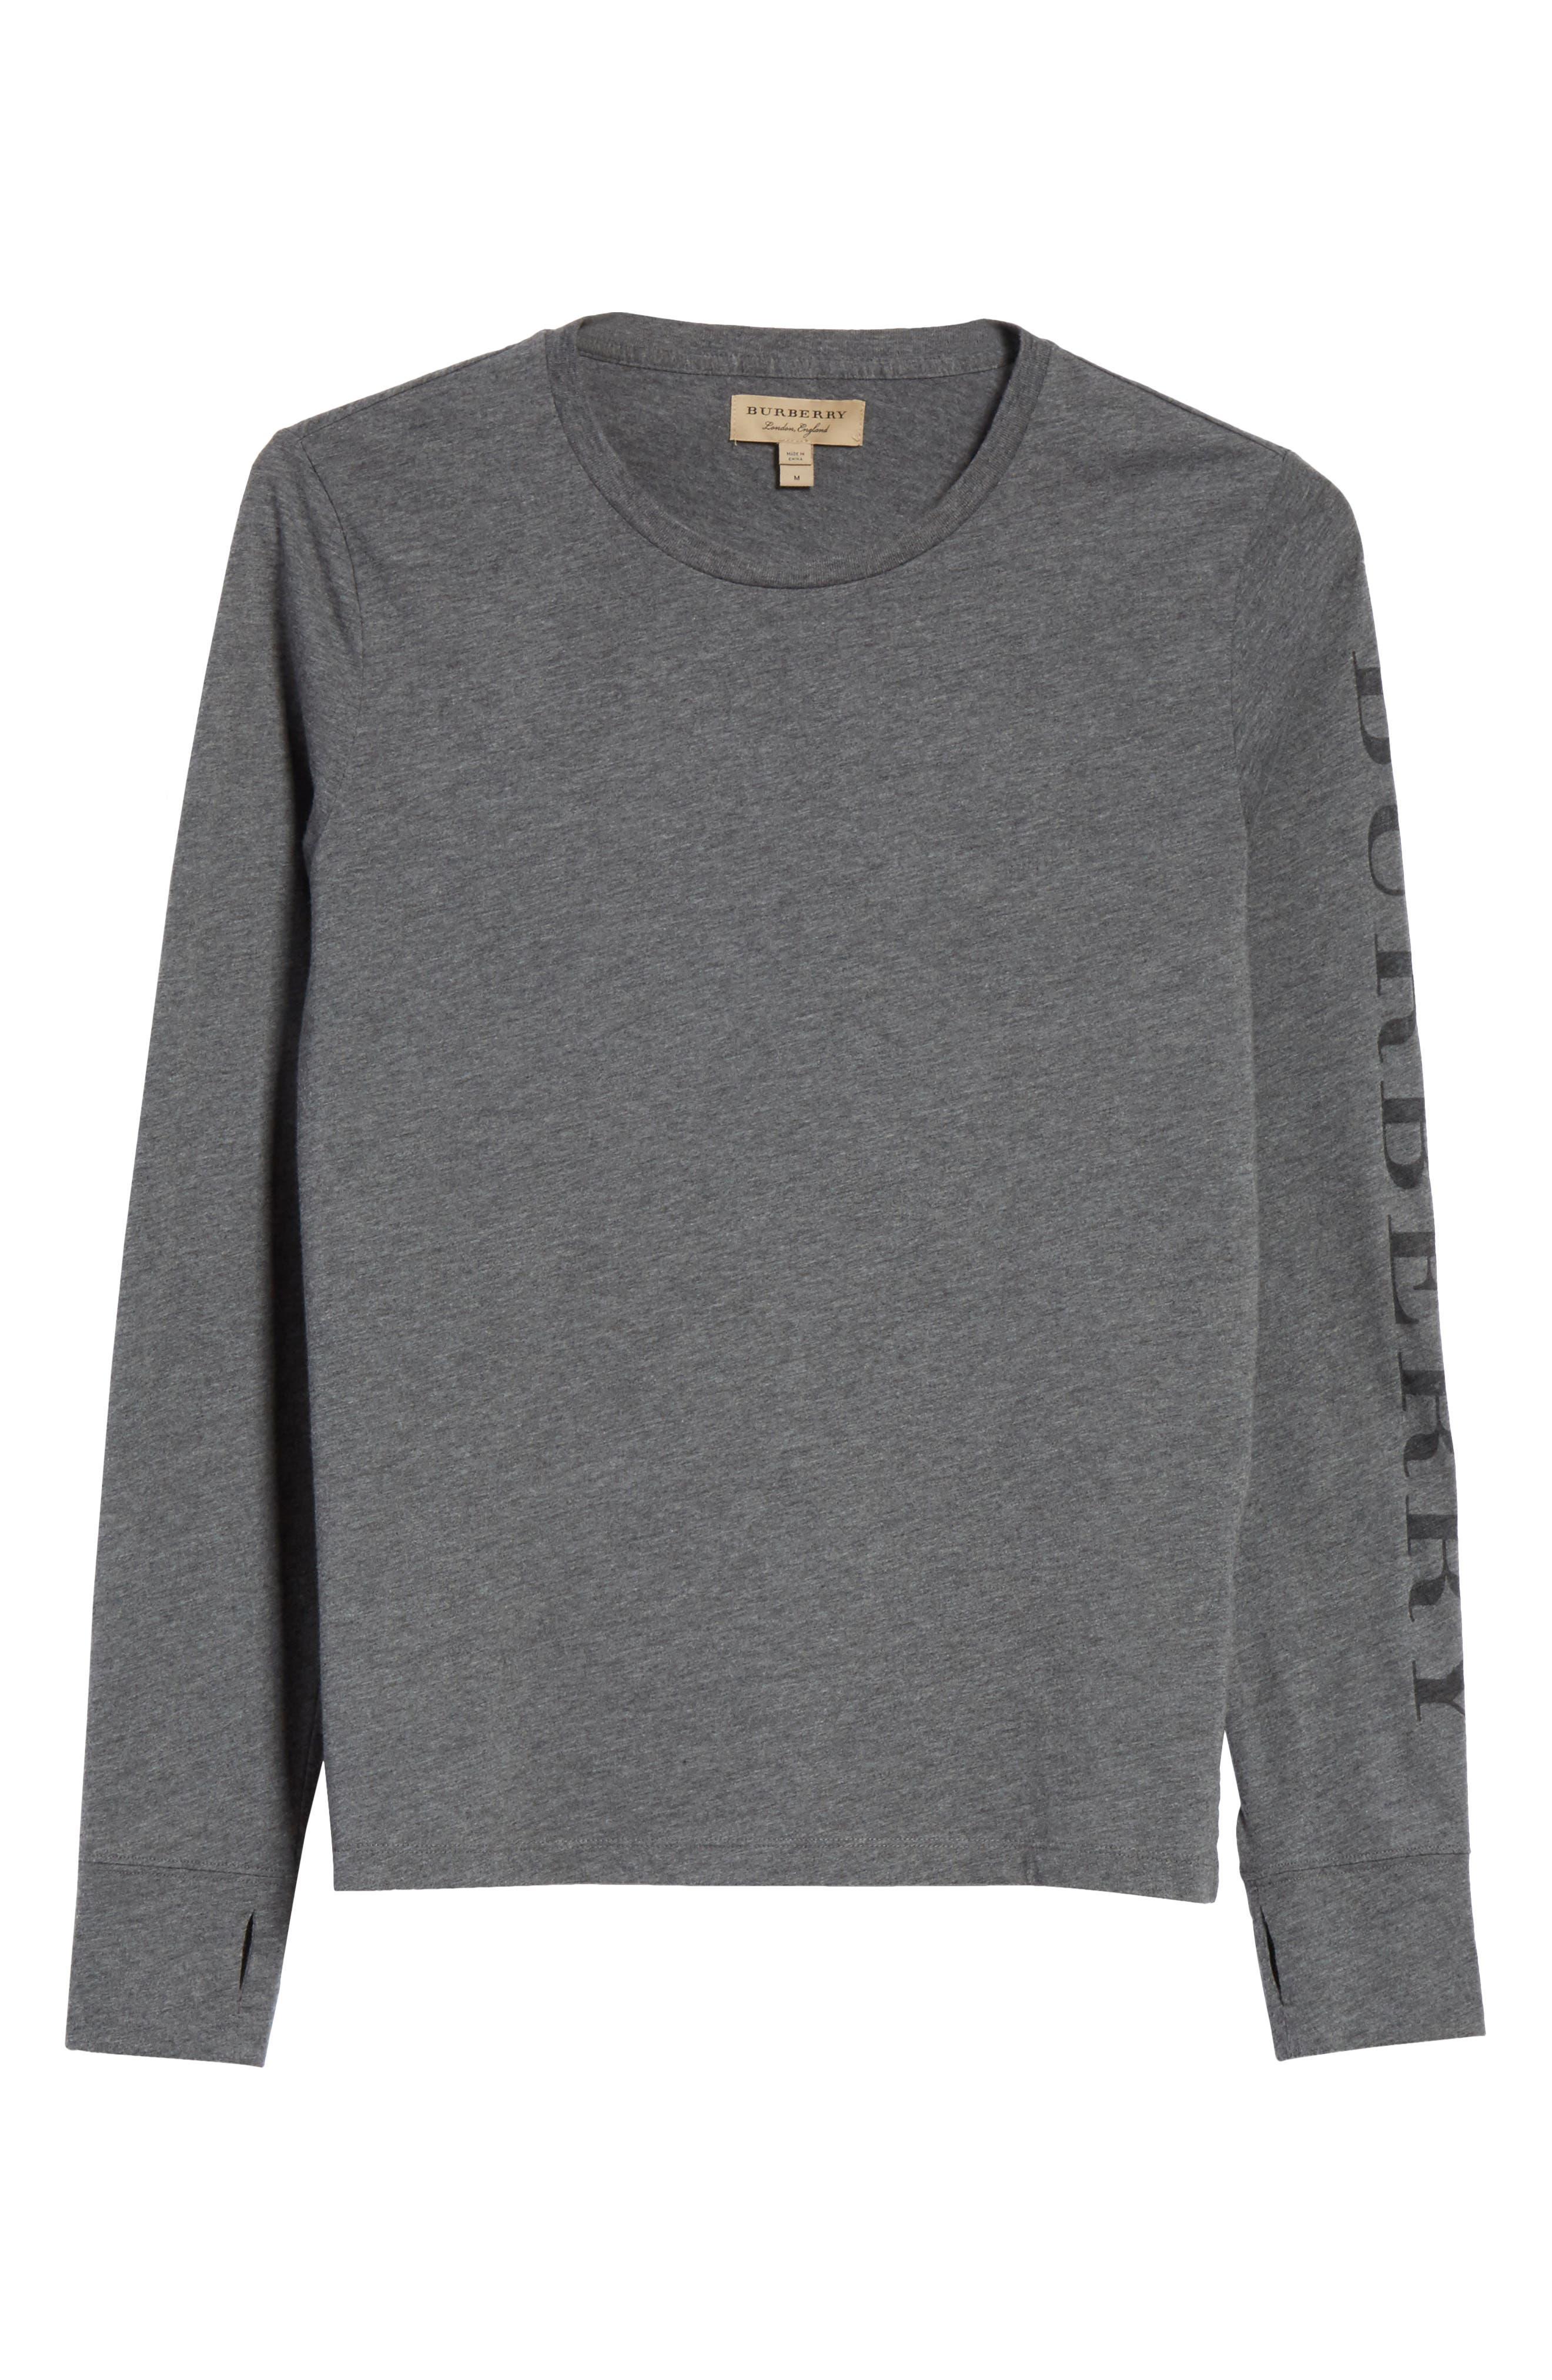 Marchston Regular Fit Crewneck Shirt,                         Main,                         color, Mid Grey Melange